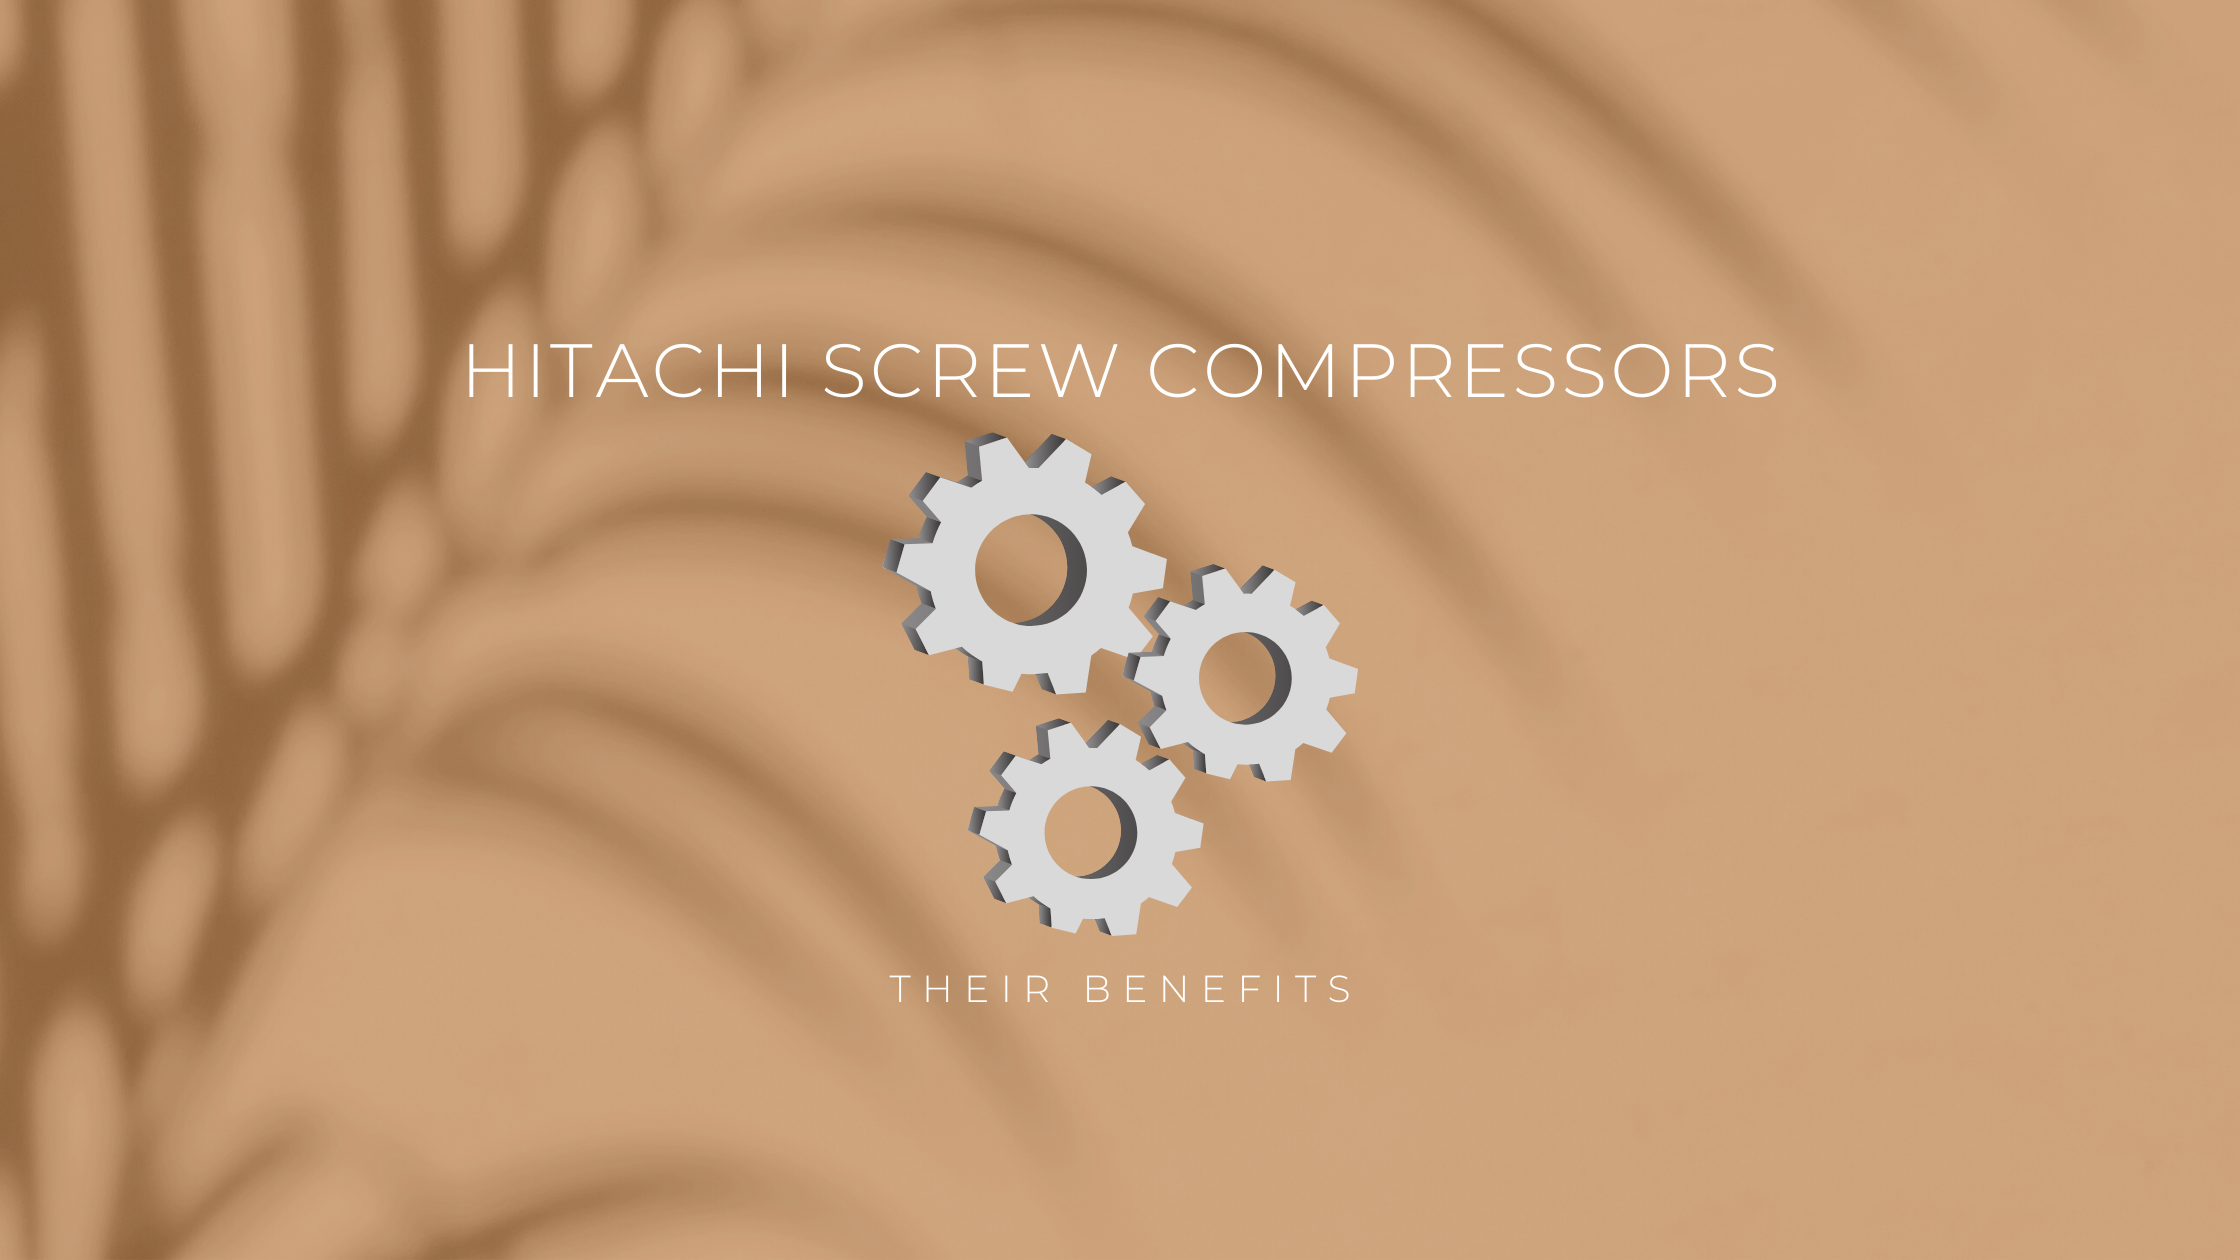 Hitachi Screw Compressor